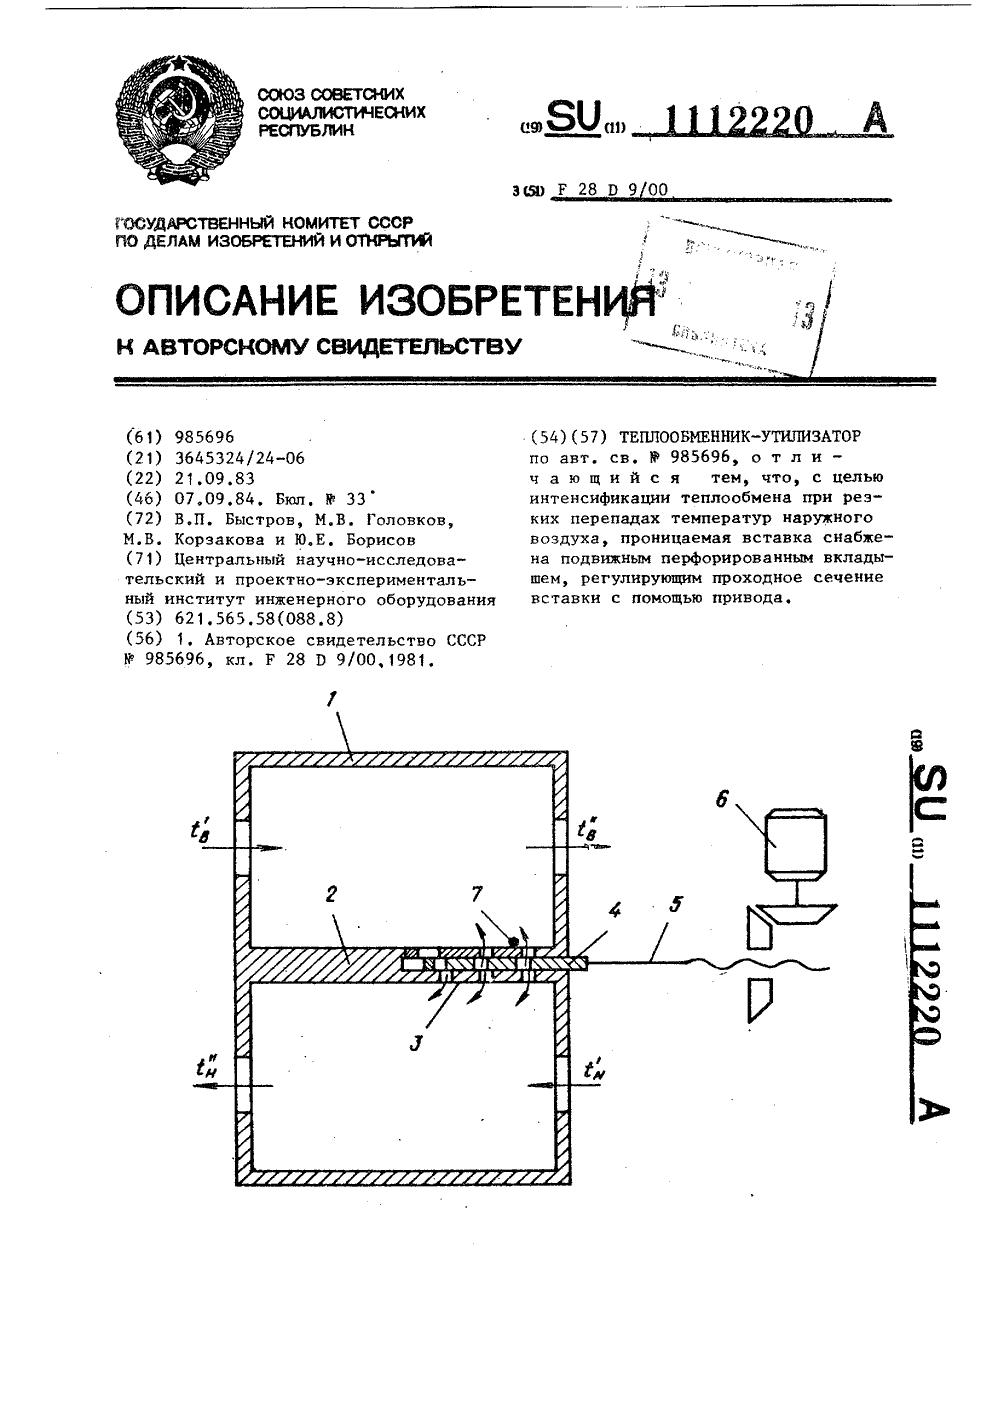 Утилизатор теплообменник Пластинчатый теплообменник Thermowave thermolinePlus TL-200 Балаково